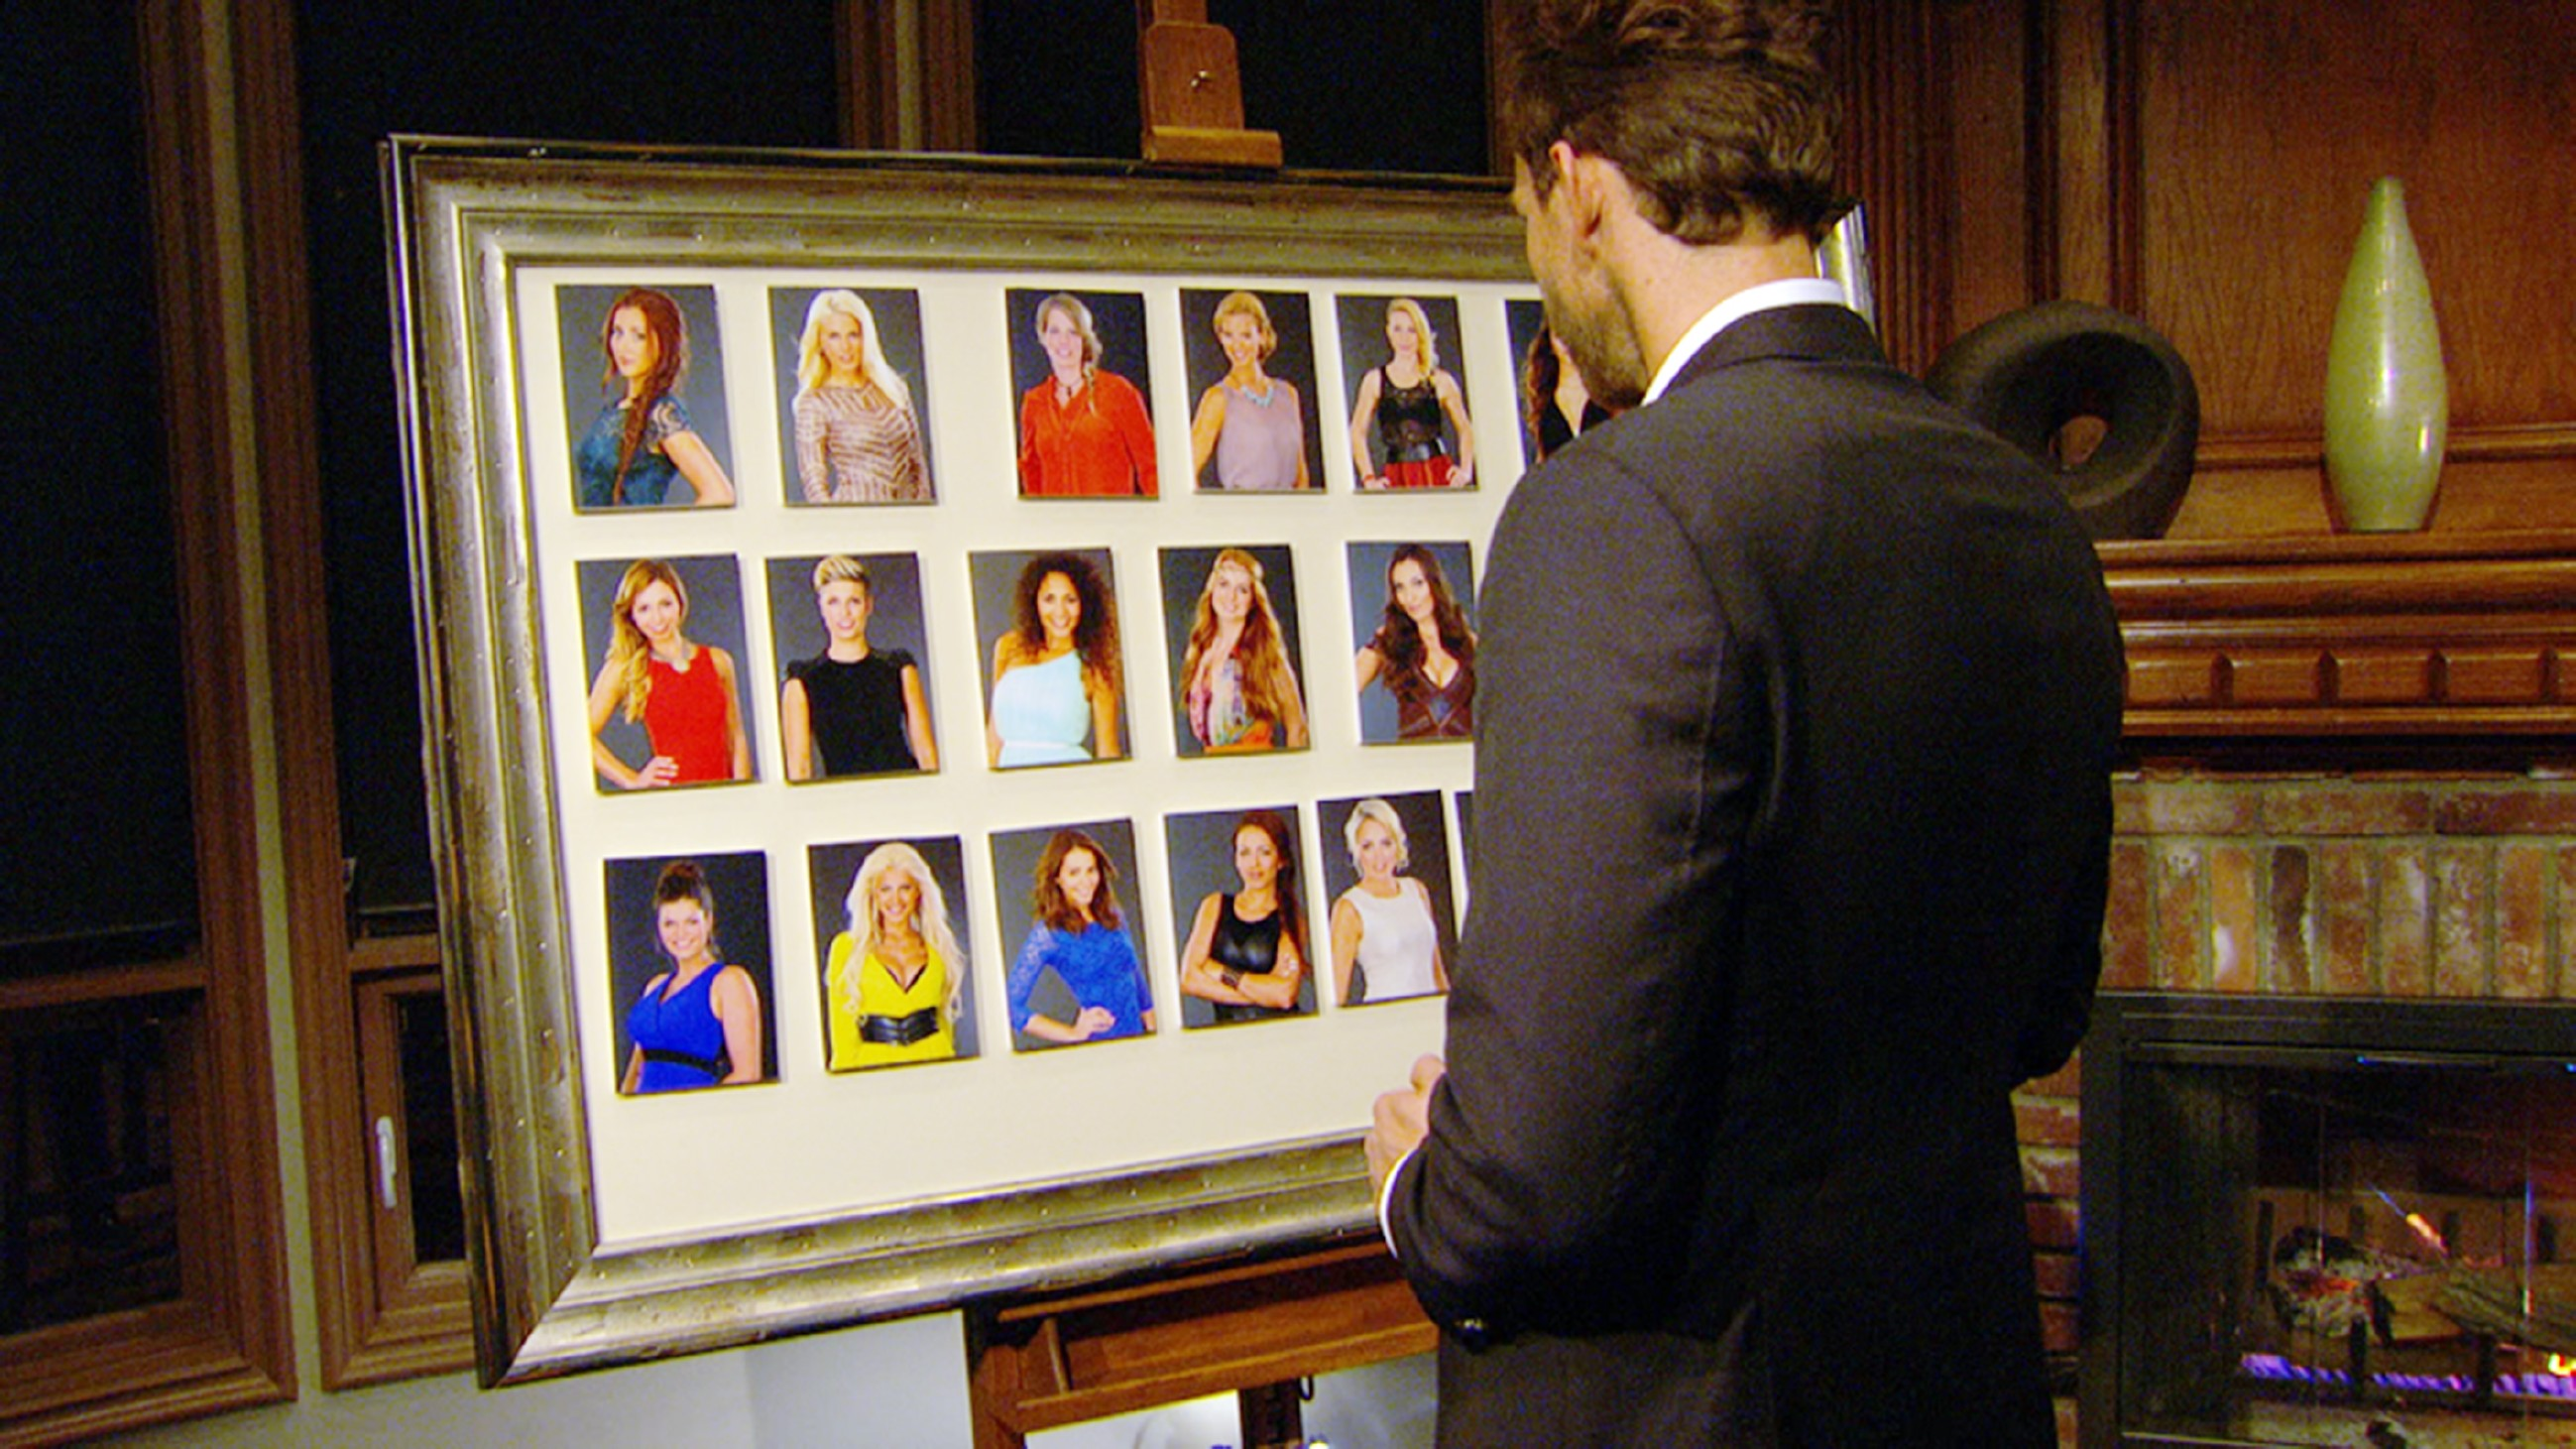 Der Bachelor 2015 - Folge 1 - Bachelor Oliver muss sich entscheiden